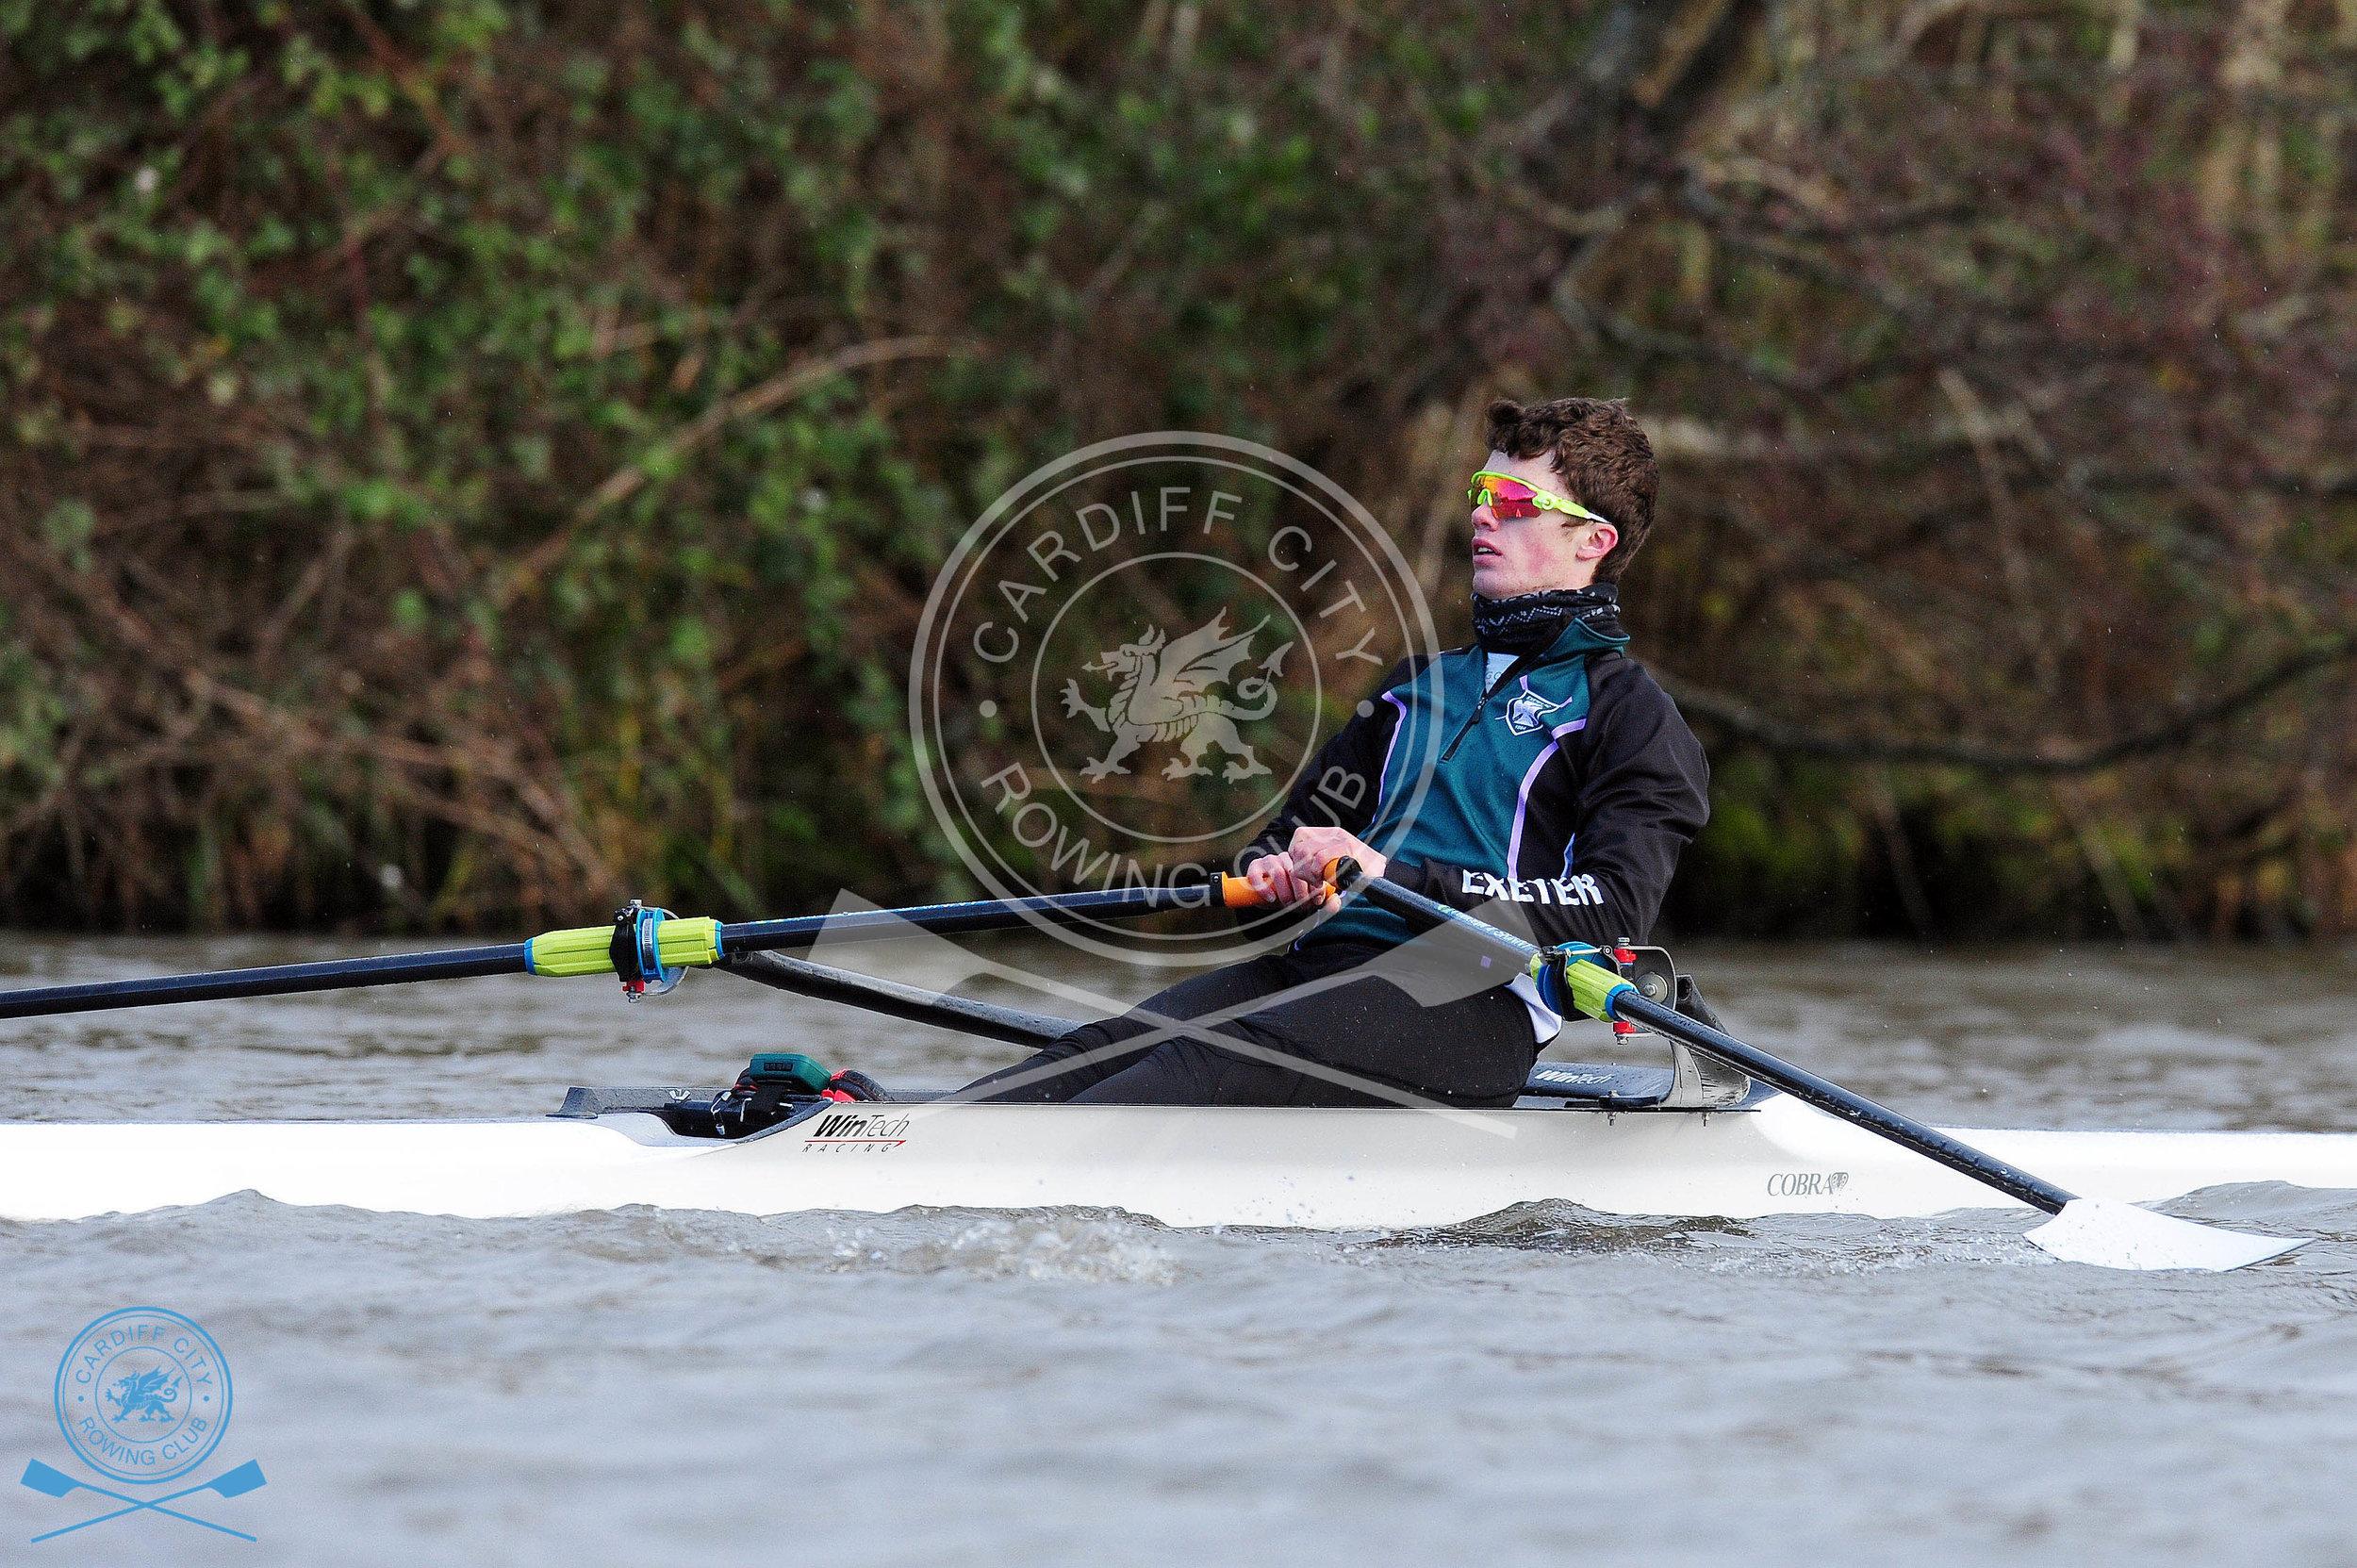 DW_280119_Cardiff_City_Rowing_317.jpg